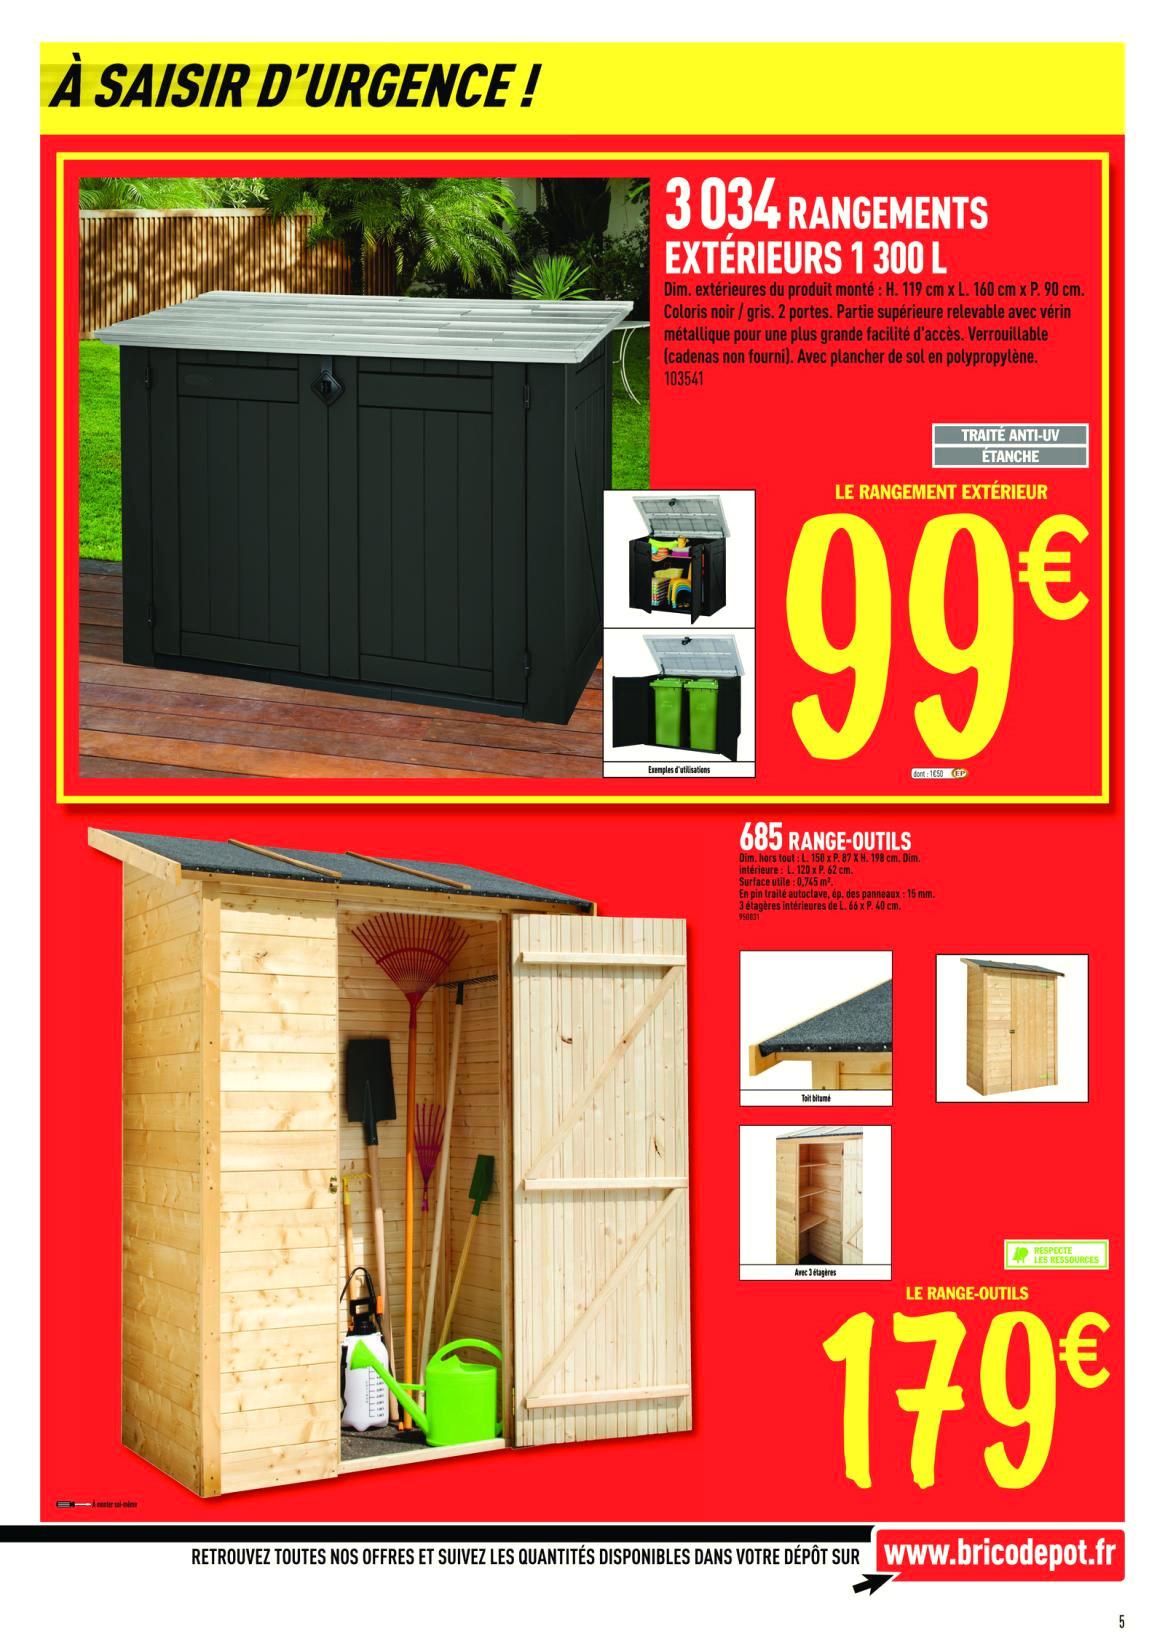 Carport Verona 5000 Gris Unique Images Carport Alu Brico Depot Design De Maison